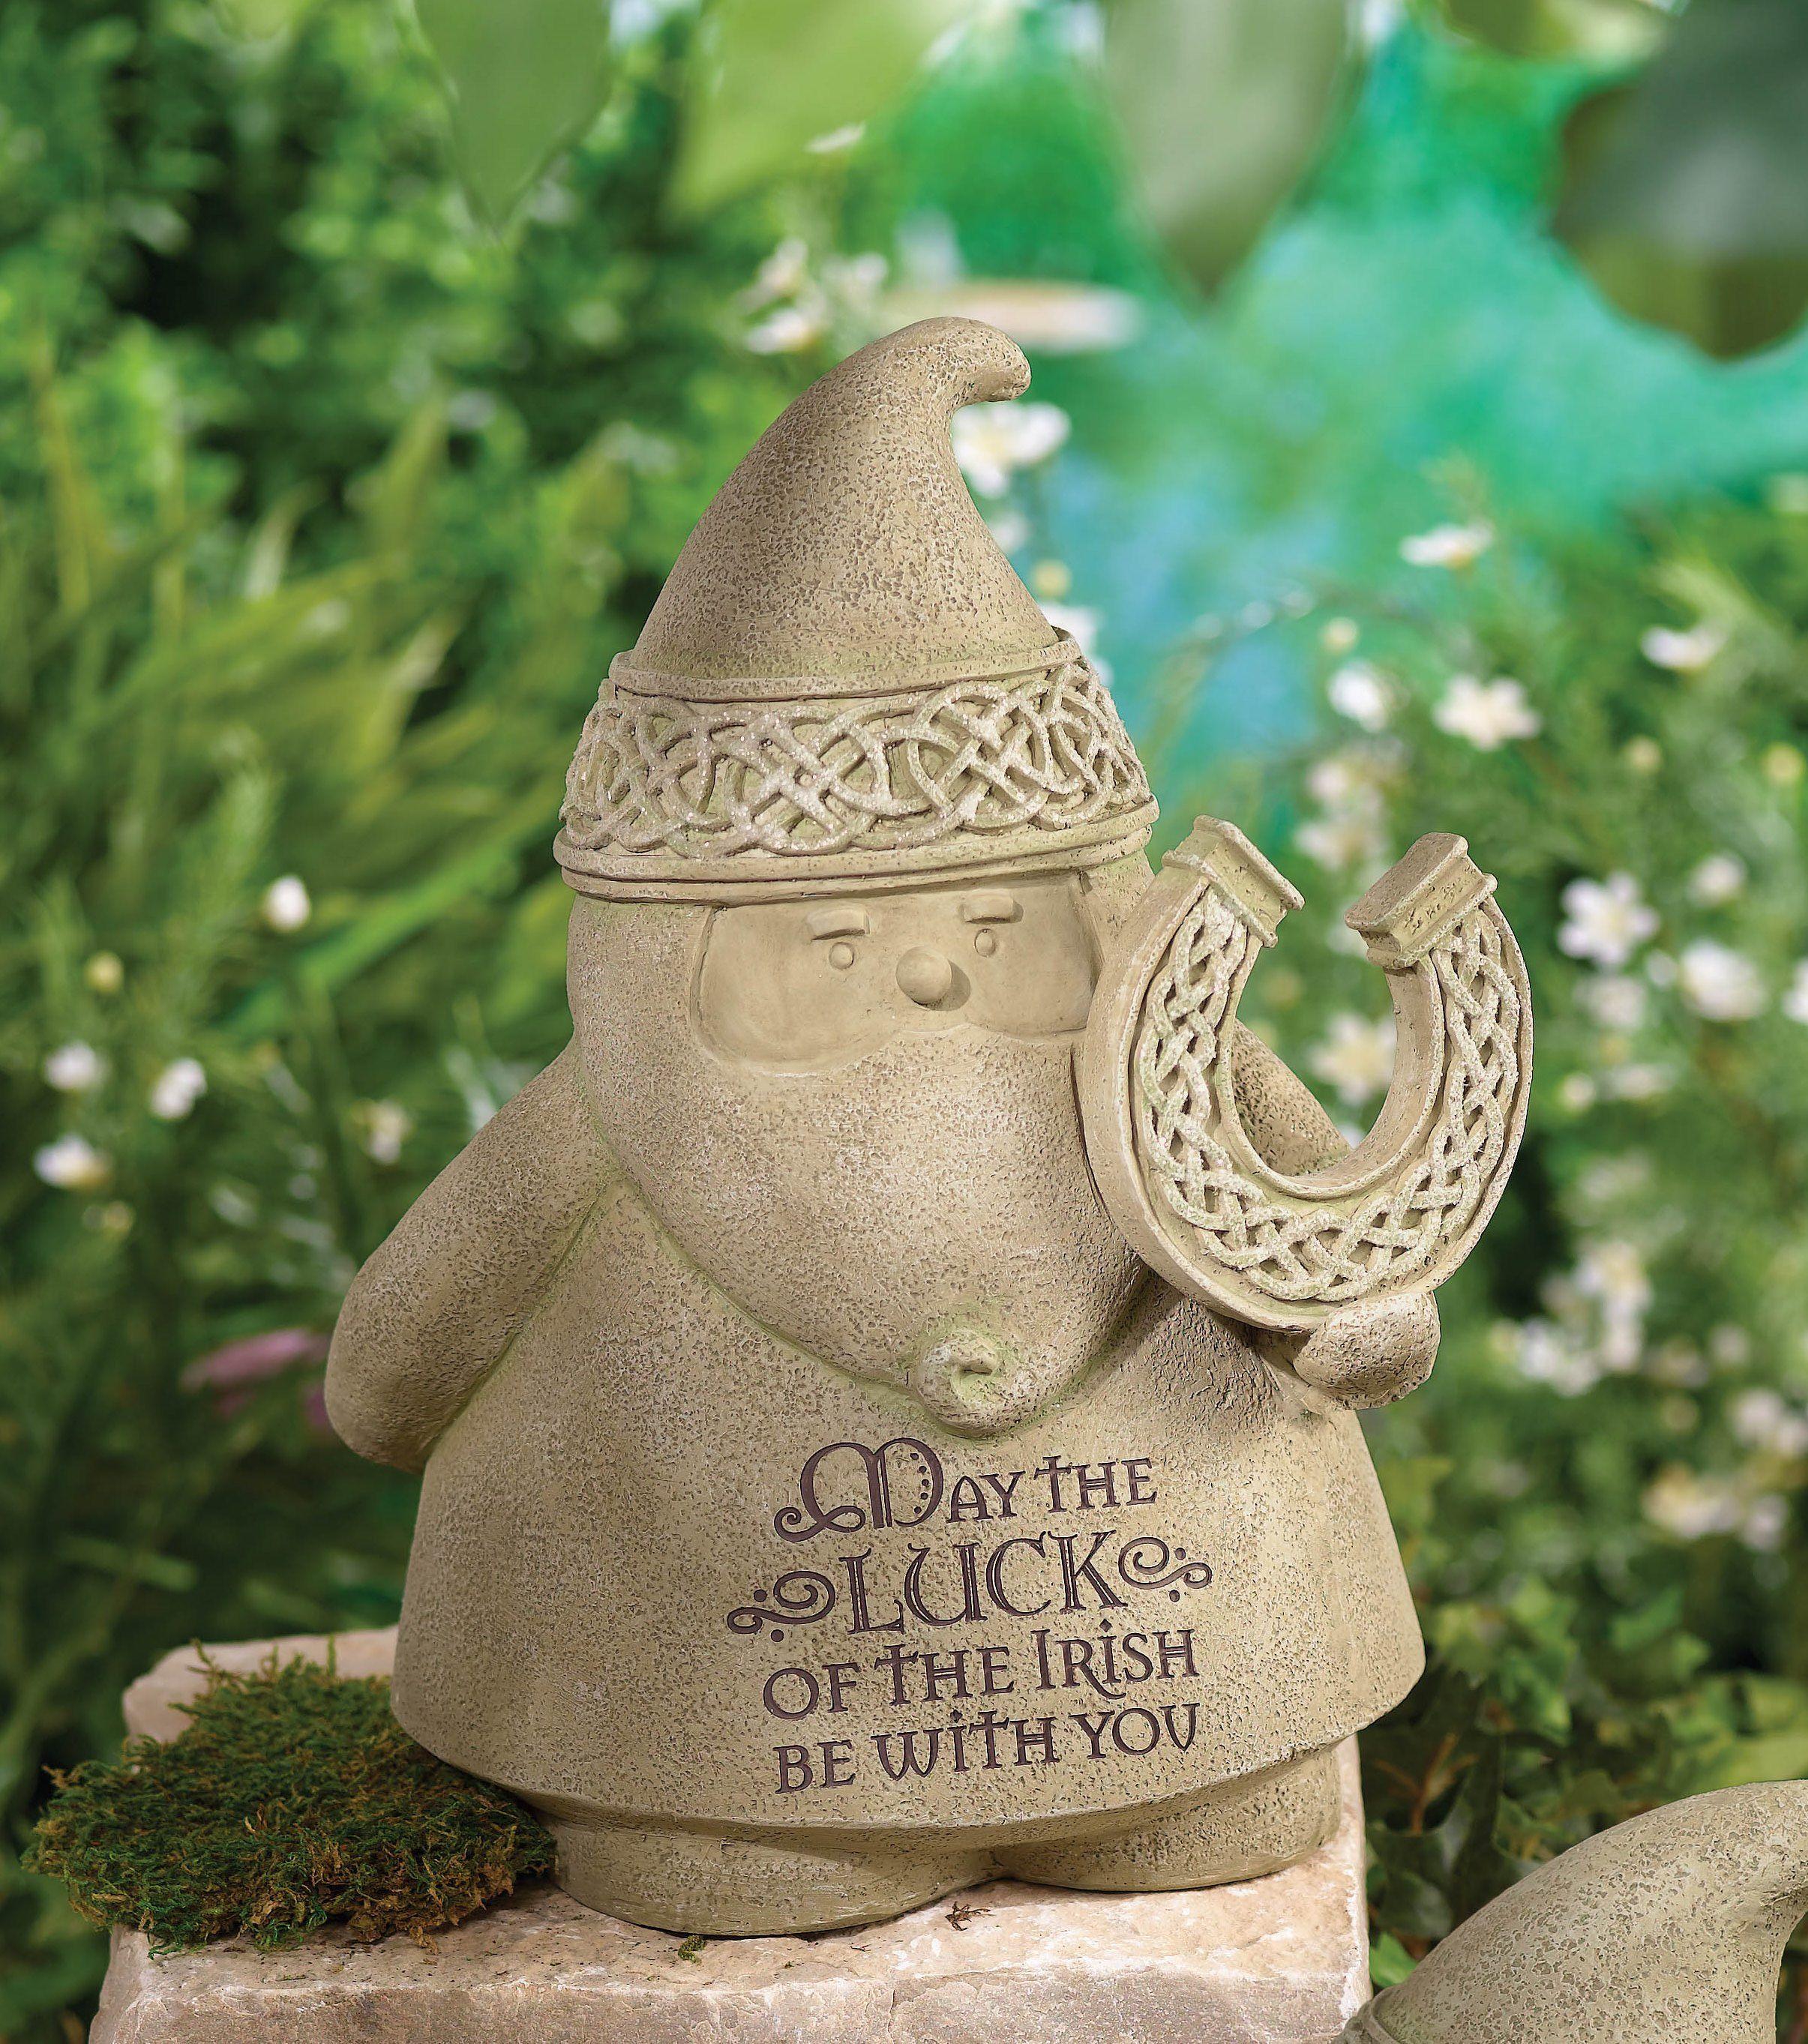 Loving this Grasslands Road 'Luck of the Irish' Celtic Gnome Figurine on #zulily! #zulilyfinds #GrasslandsRoad #Cement #Cute #Garden #Decor #Lucky